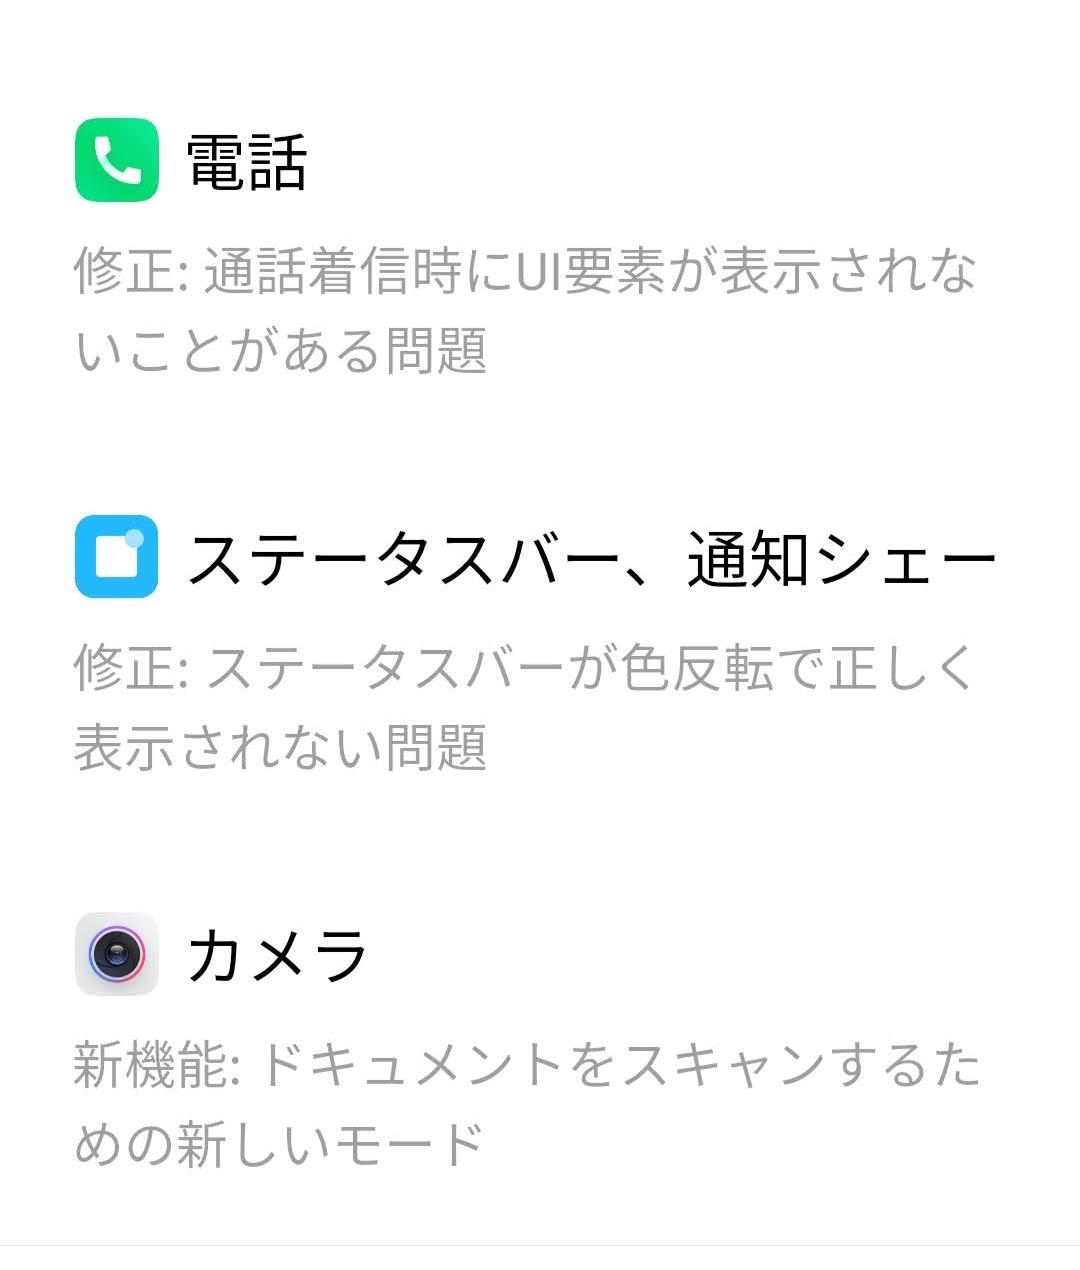 f:id:konosakimatukura:20201031024326j:plain